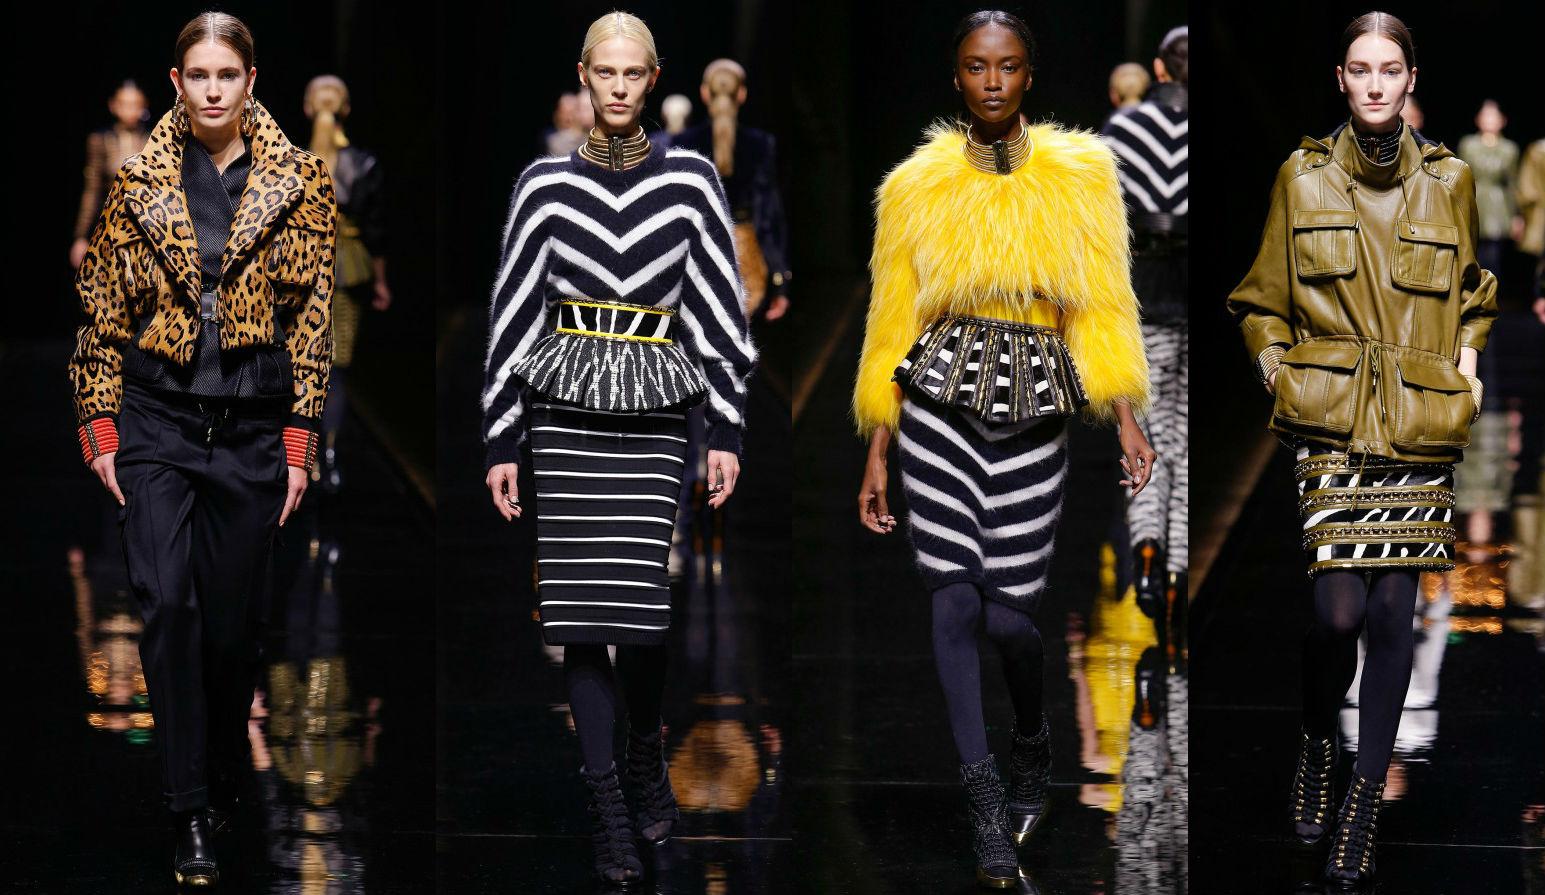 Коллекция женской одежды Balmain Fall-Winter 2014-2015